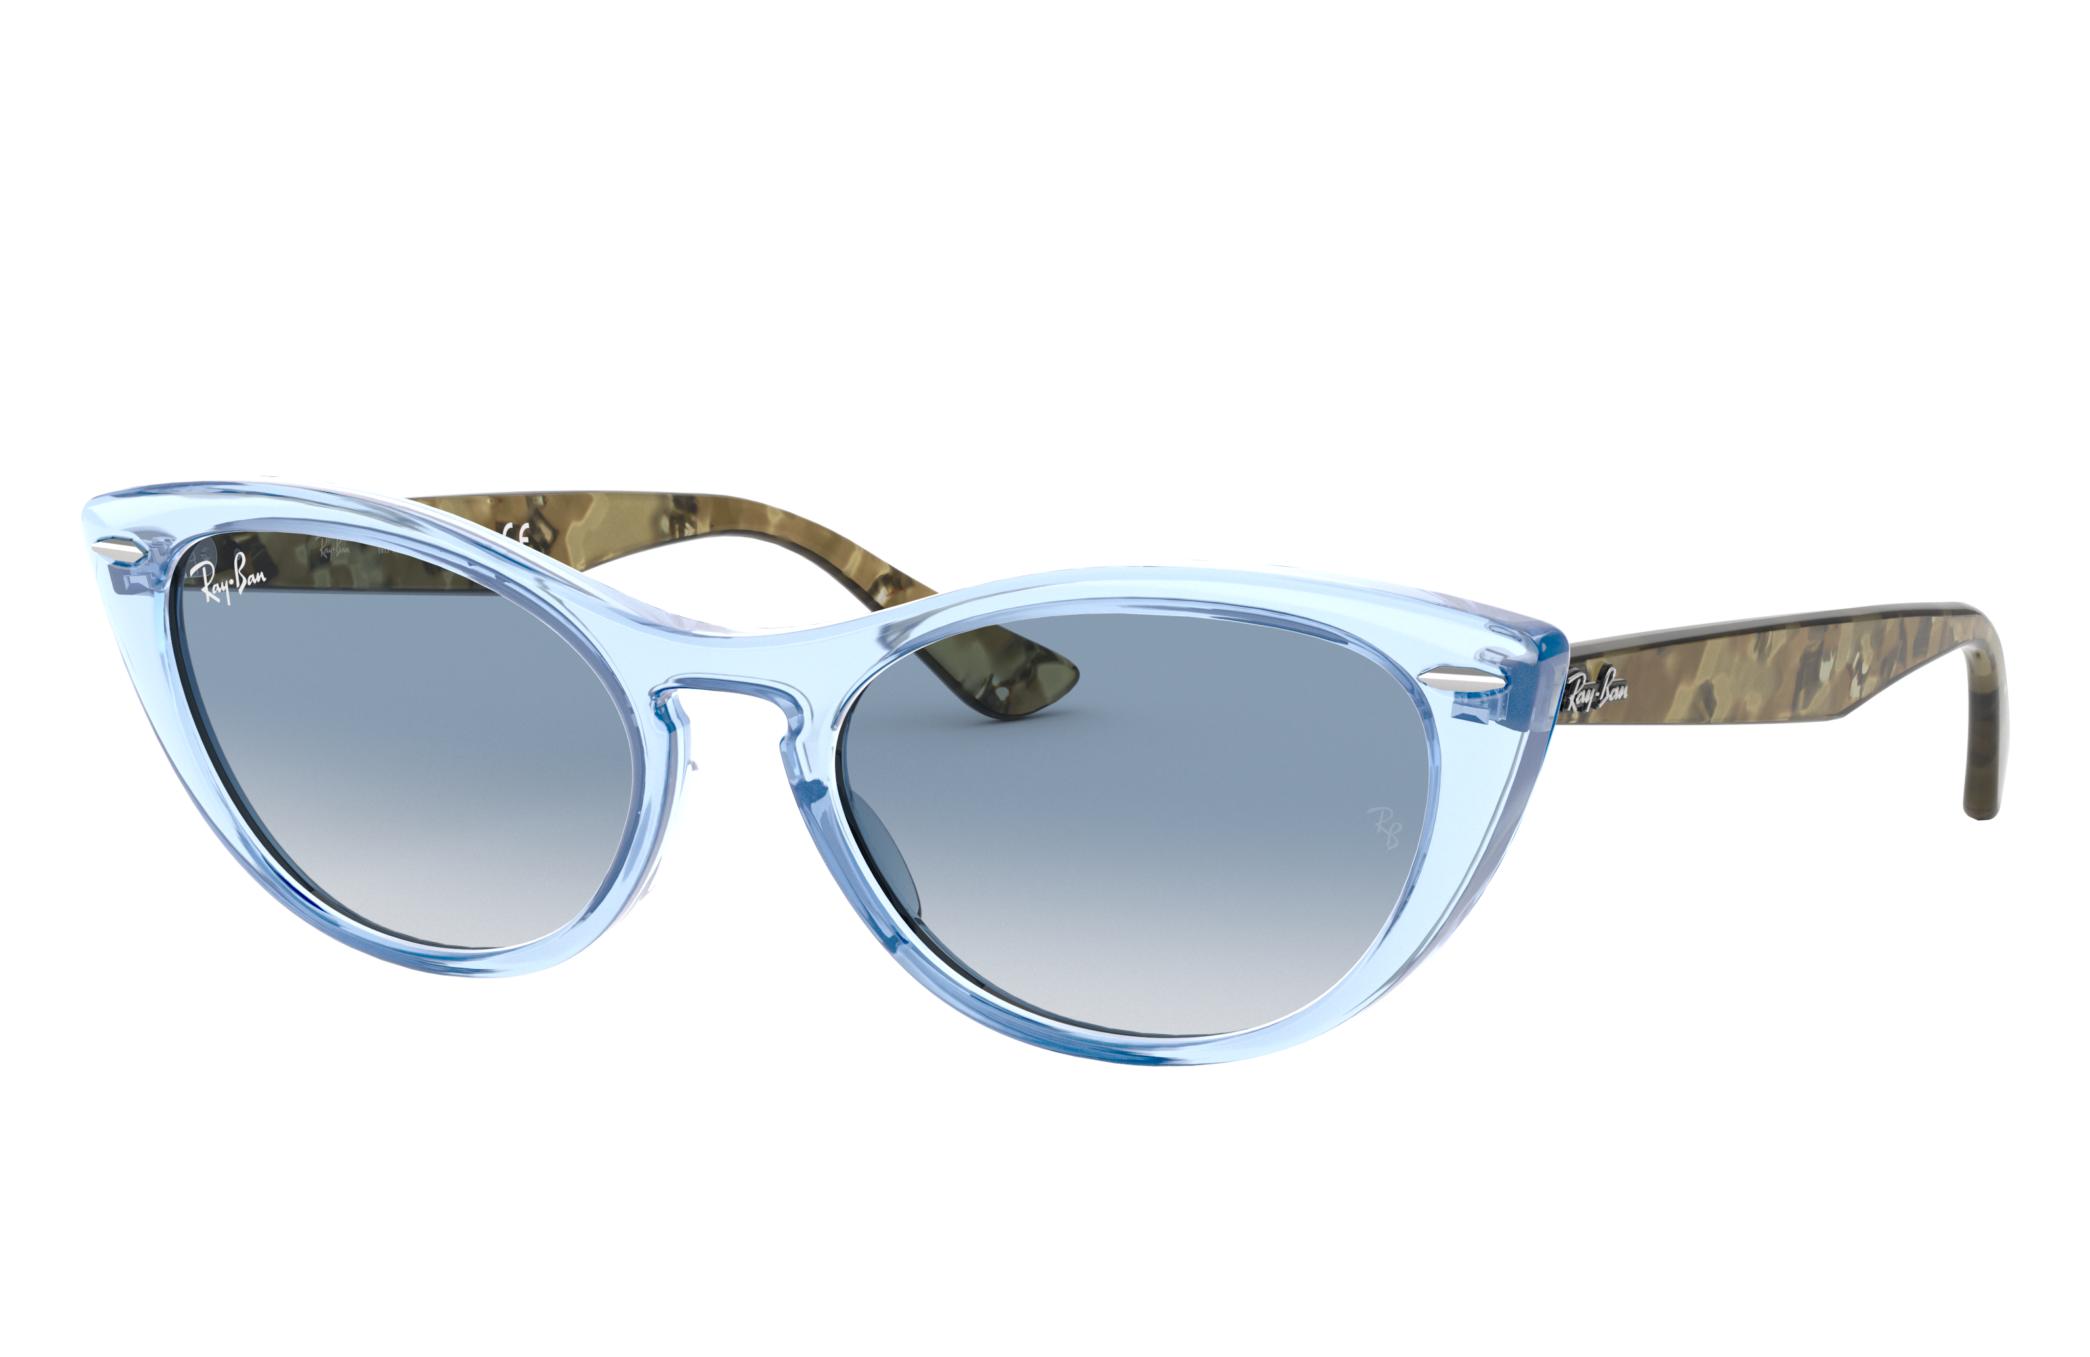 Ray-Ban Nina Green Havana, Blue Lenses - RB4314N